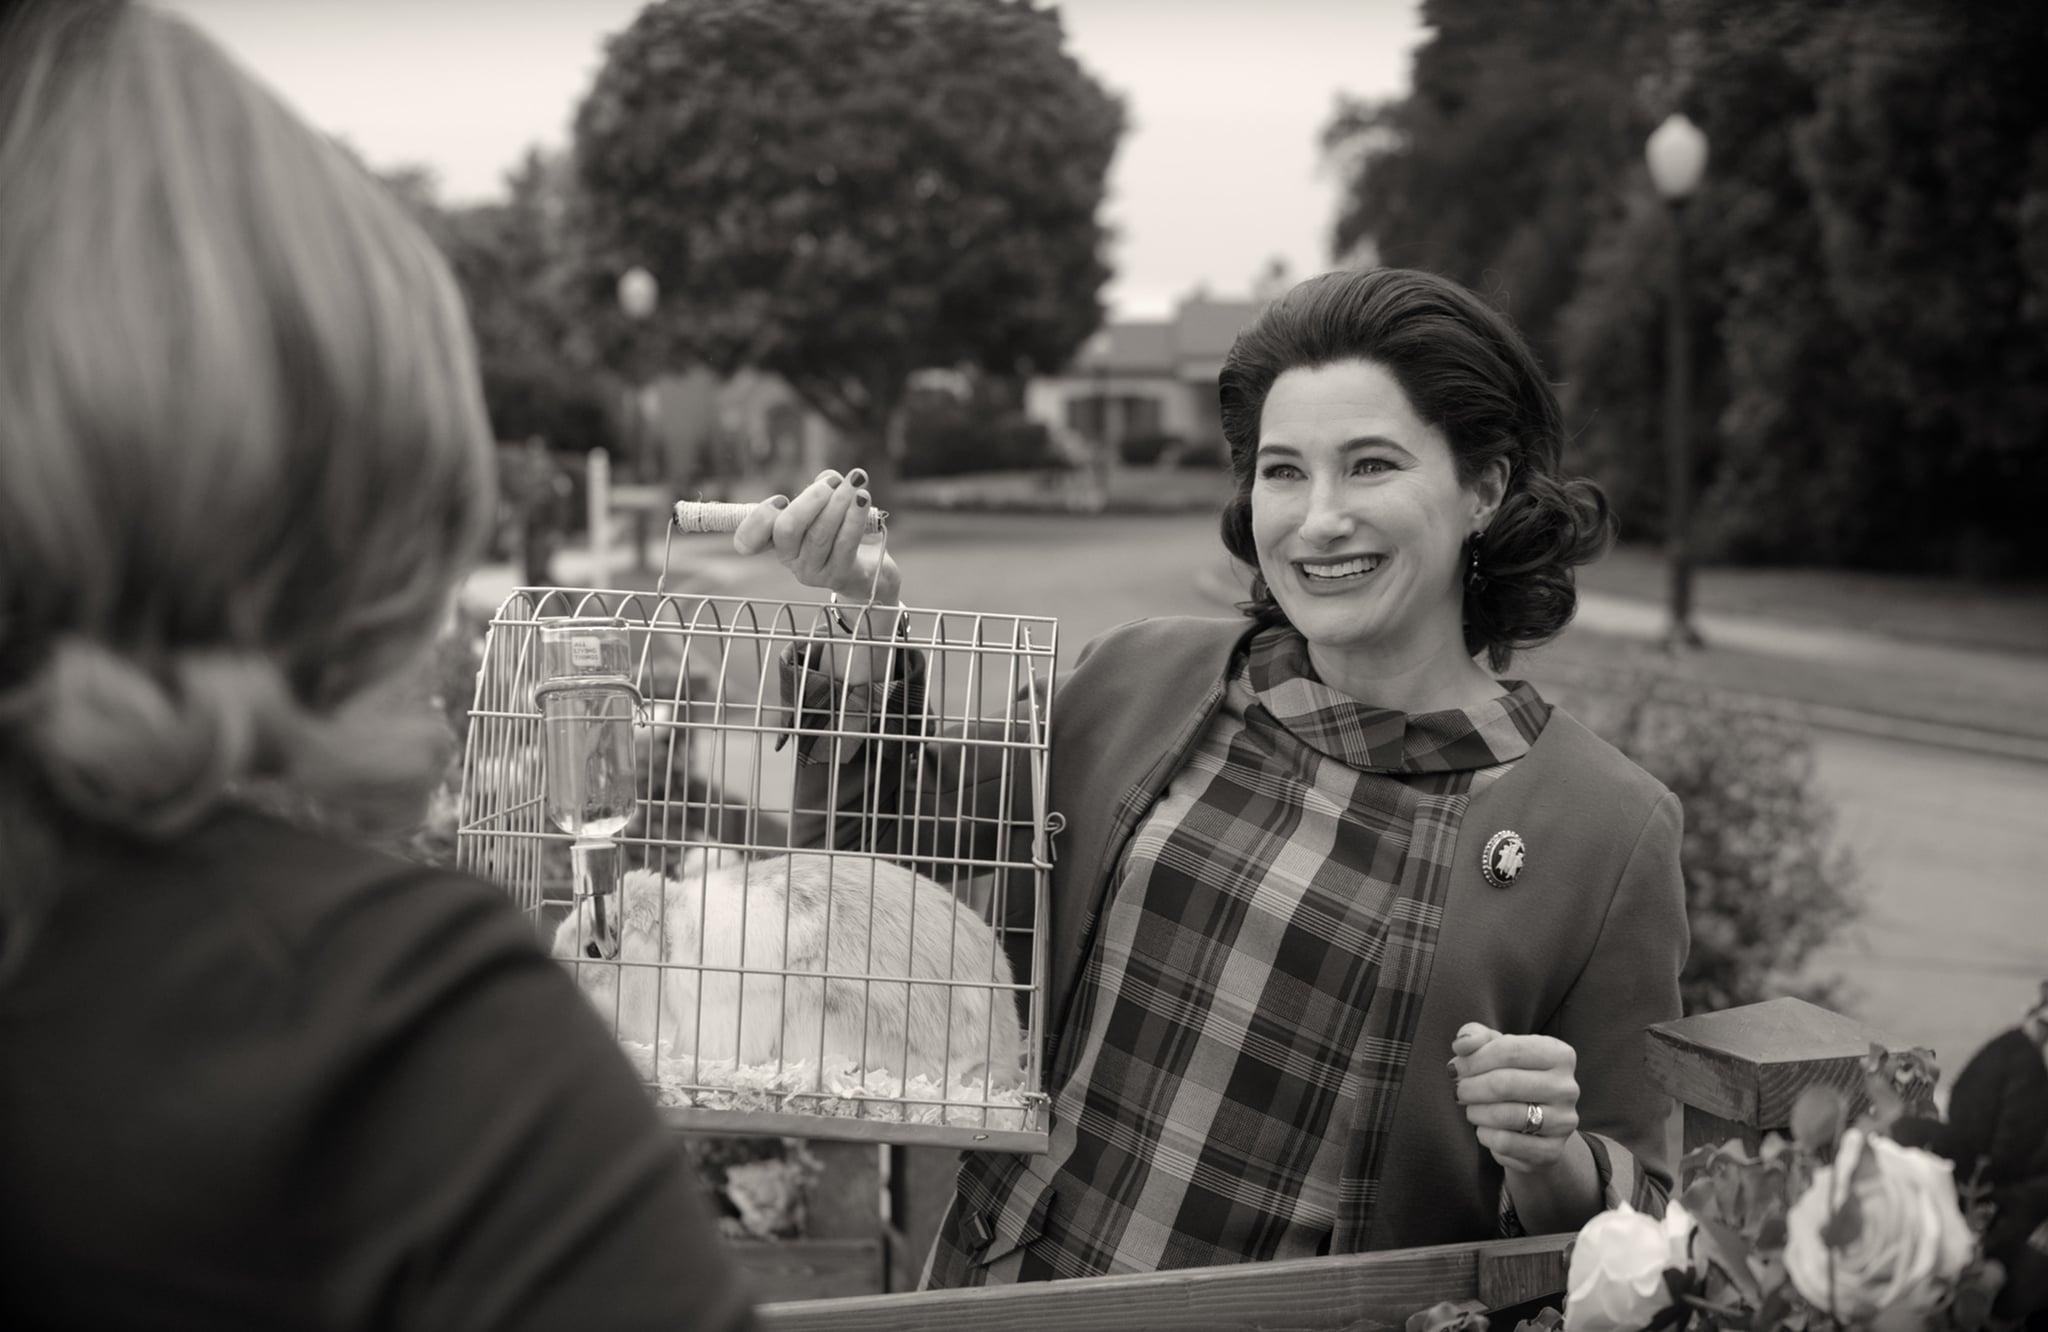 Agnes getting Wanda the Rabbit